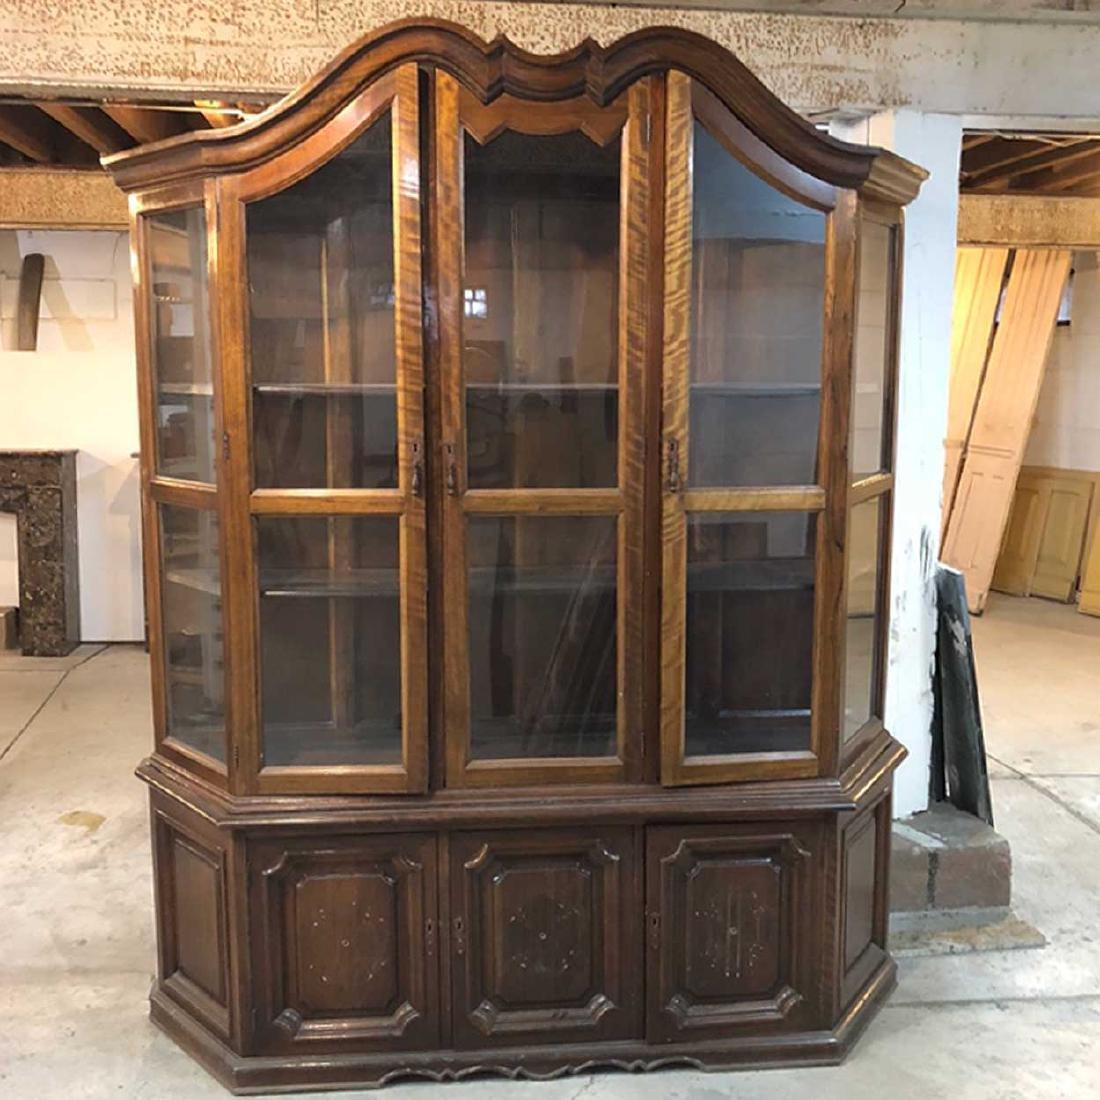 Vintage Two-Part Walnut Display Cabinet